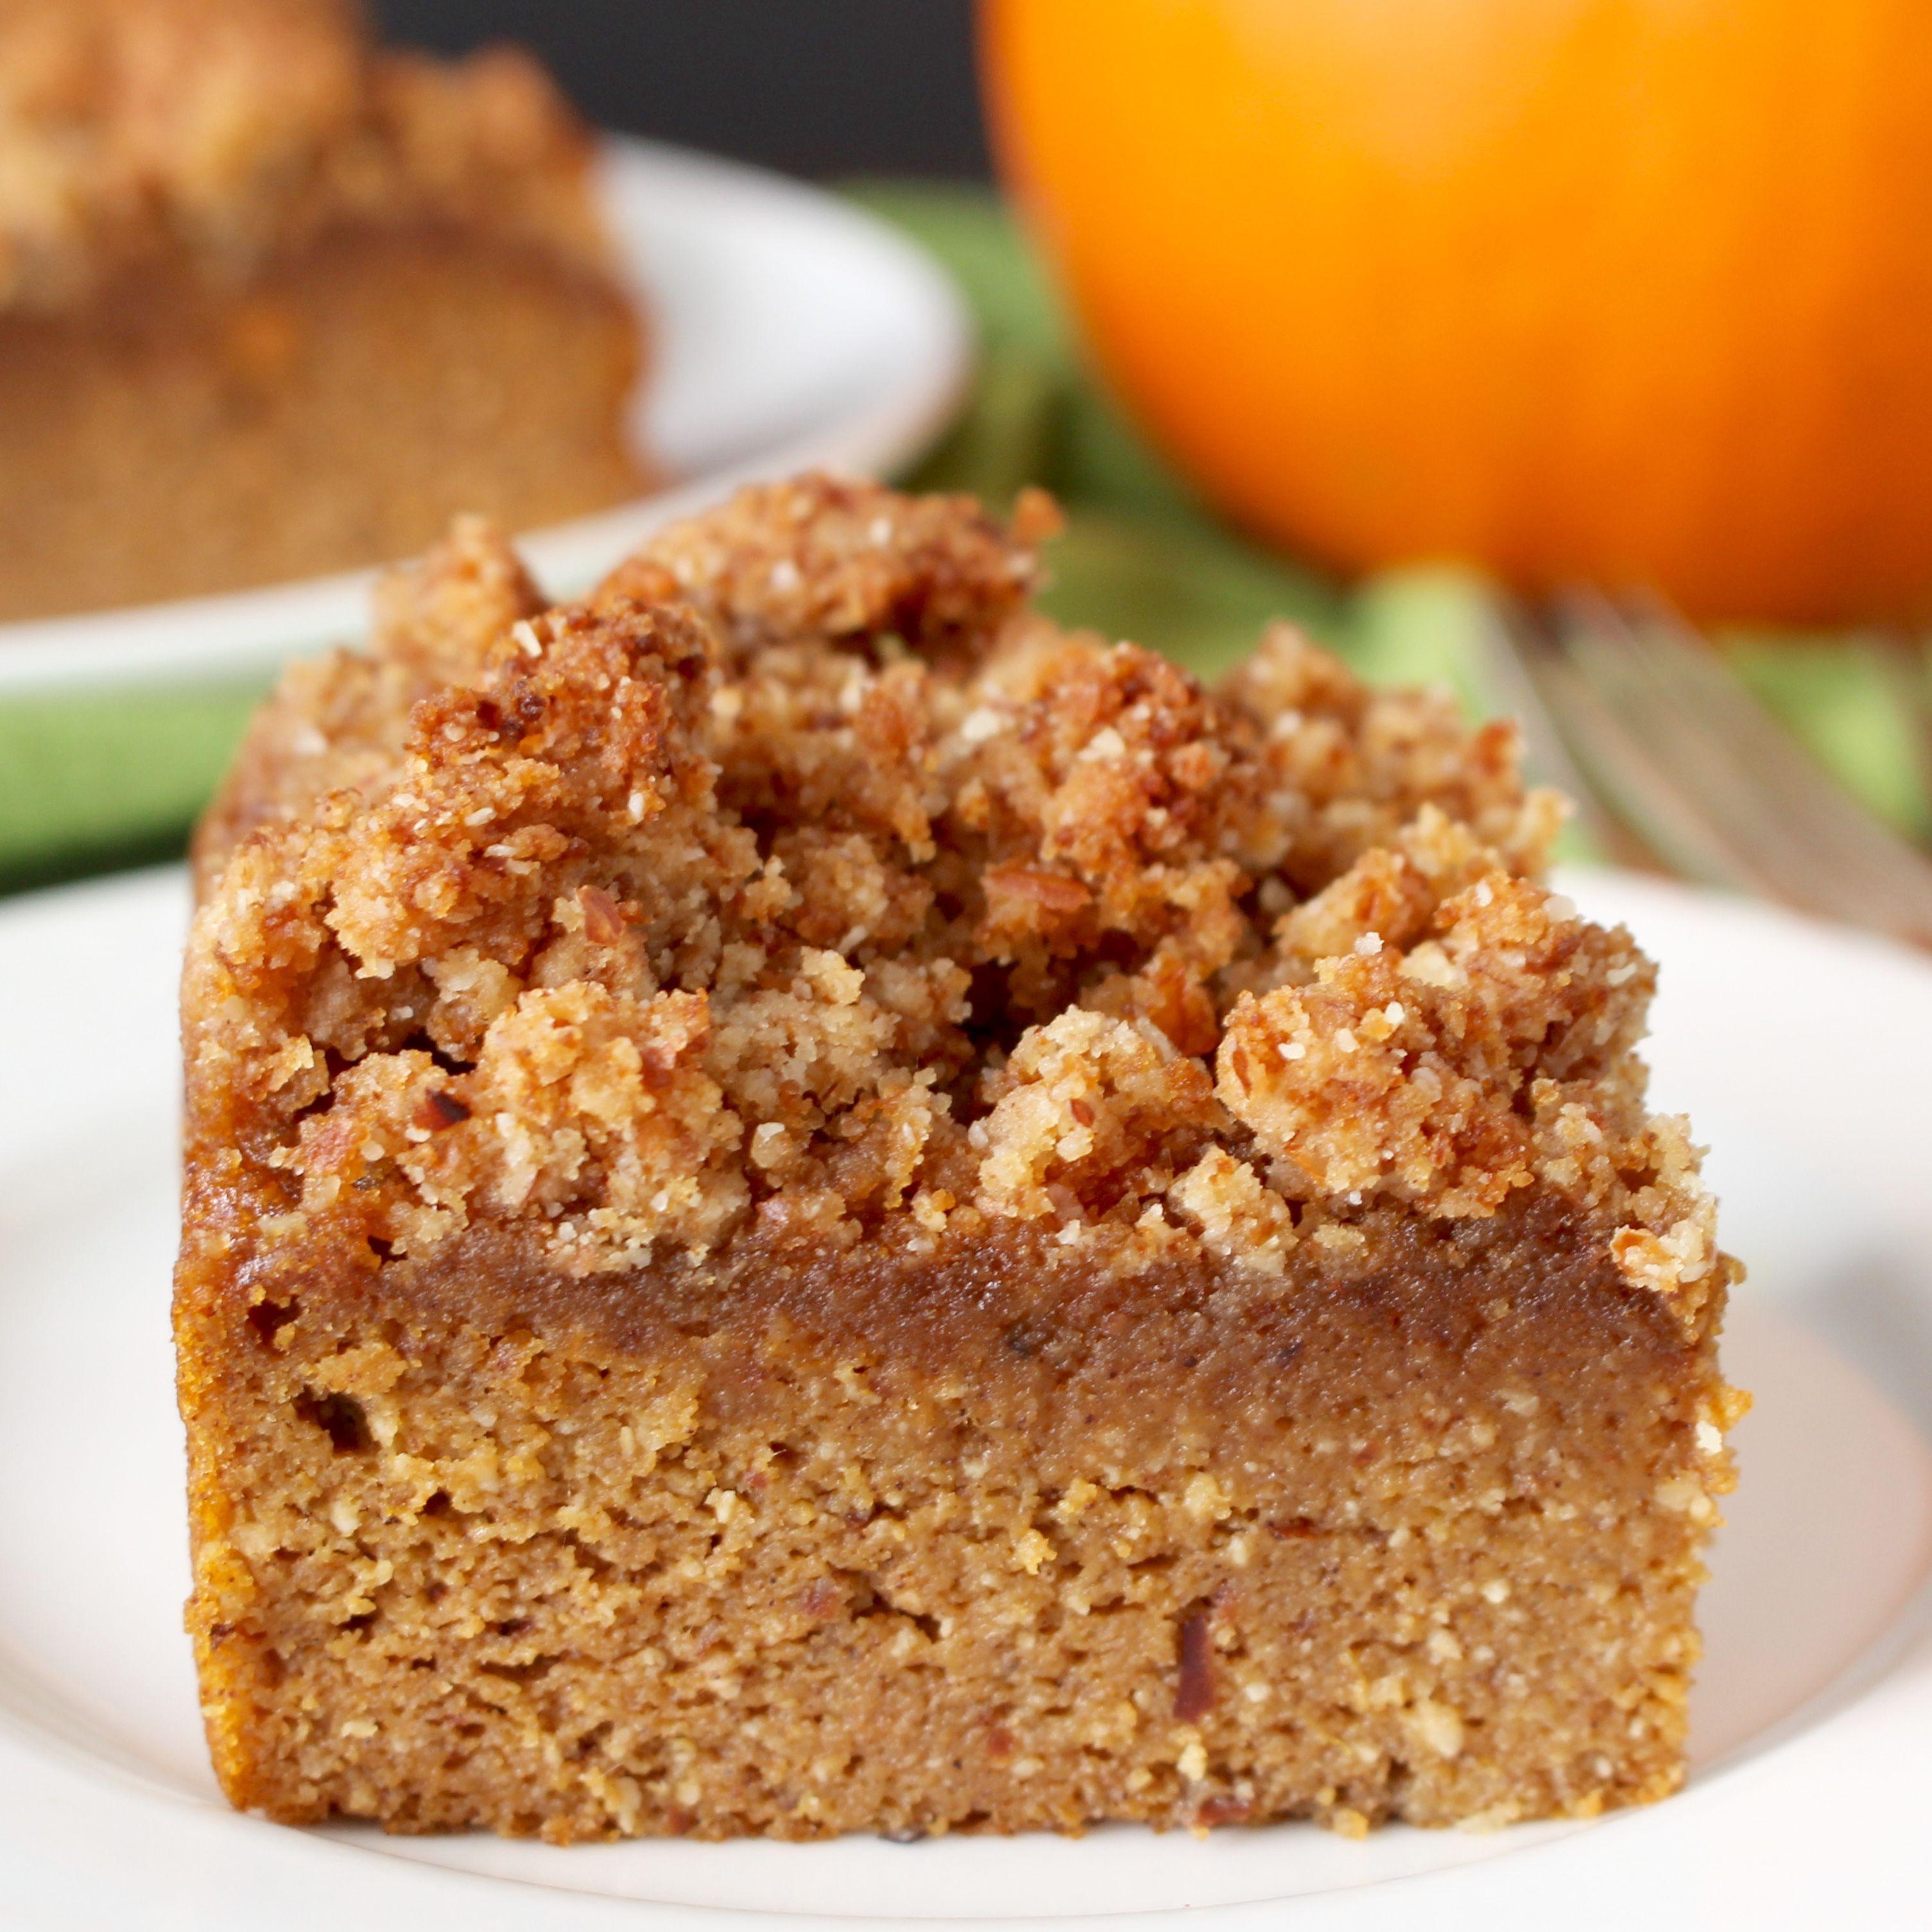 Paleo pumpkin coffee cake recipe almond flour pumpkin coffee cakes and sugar free - Coffee cake recipes ...